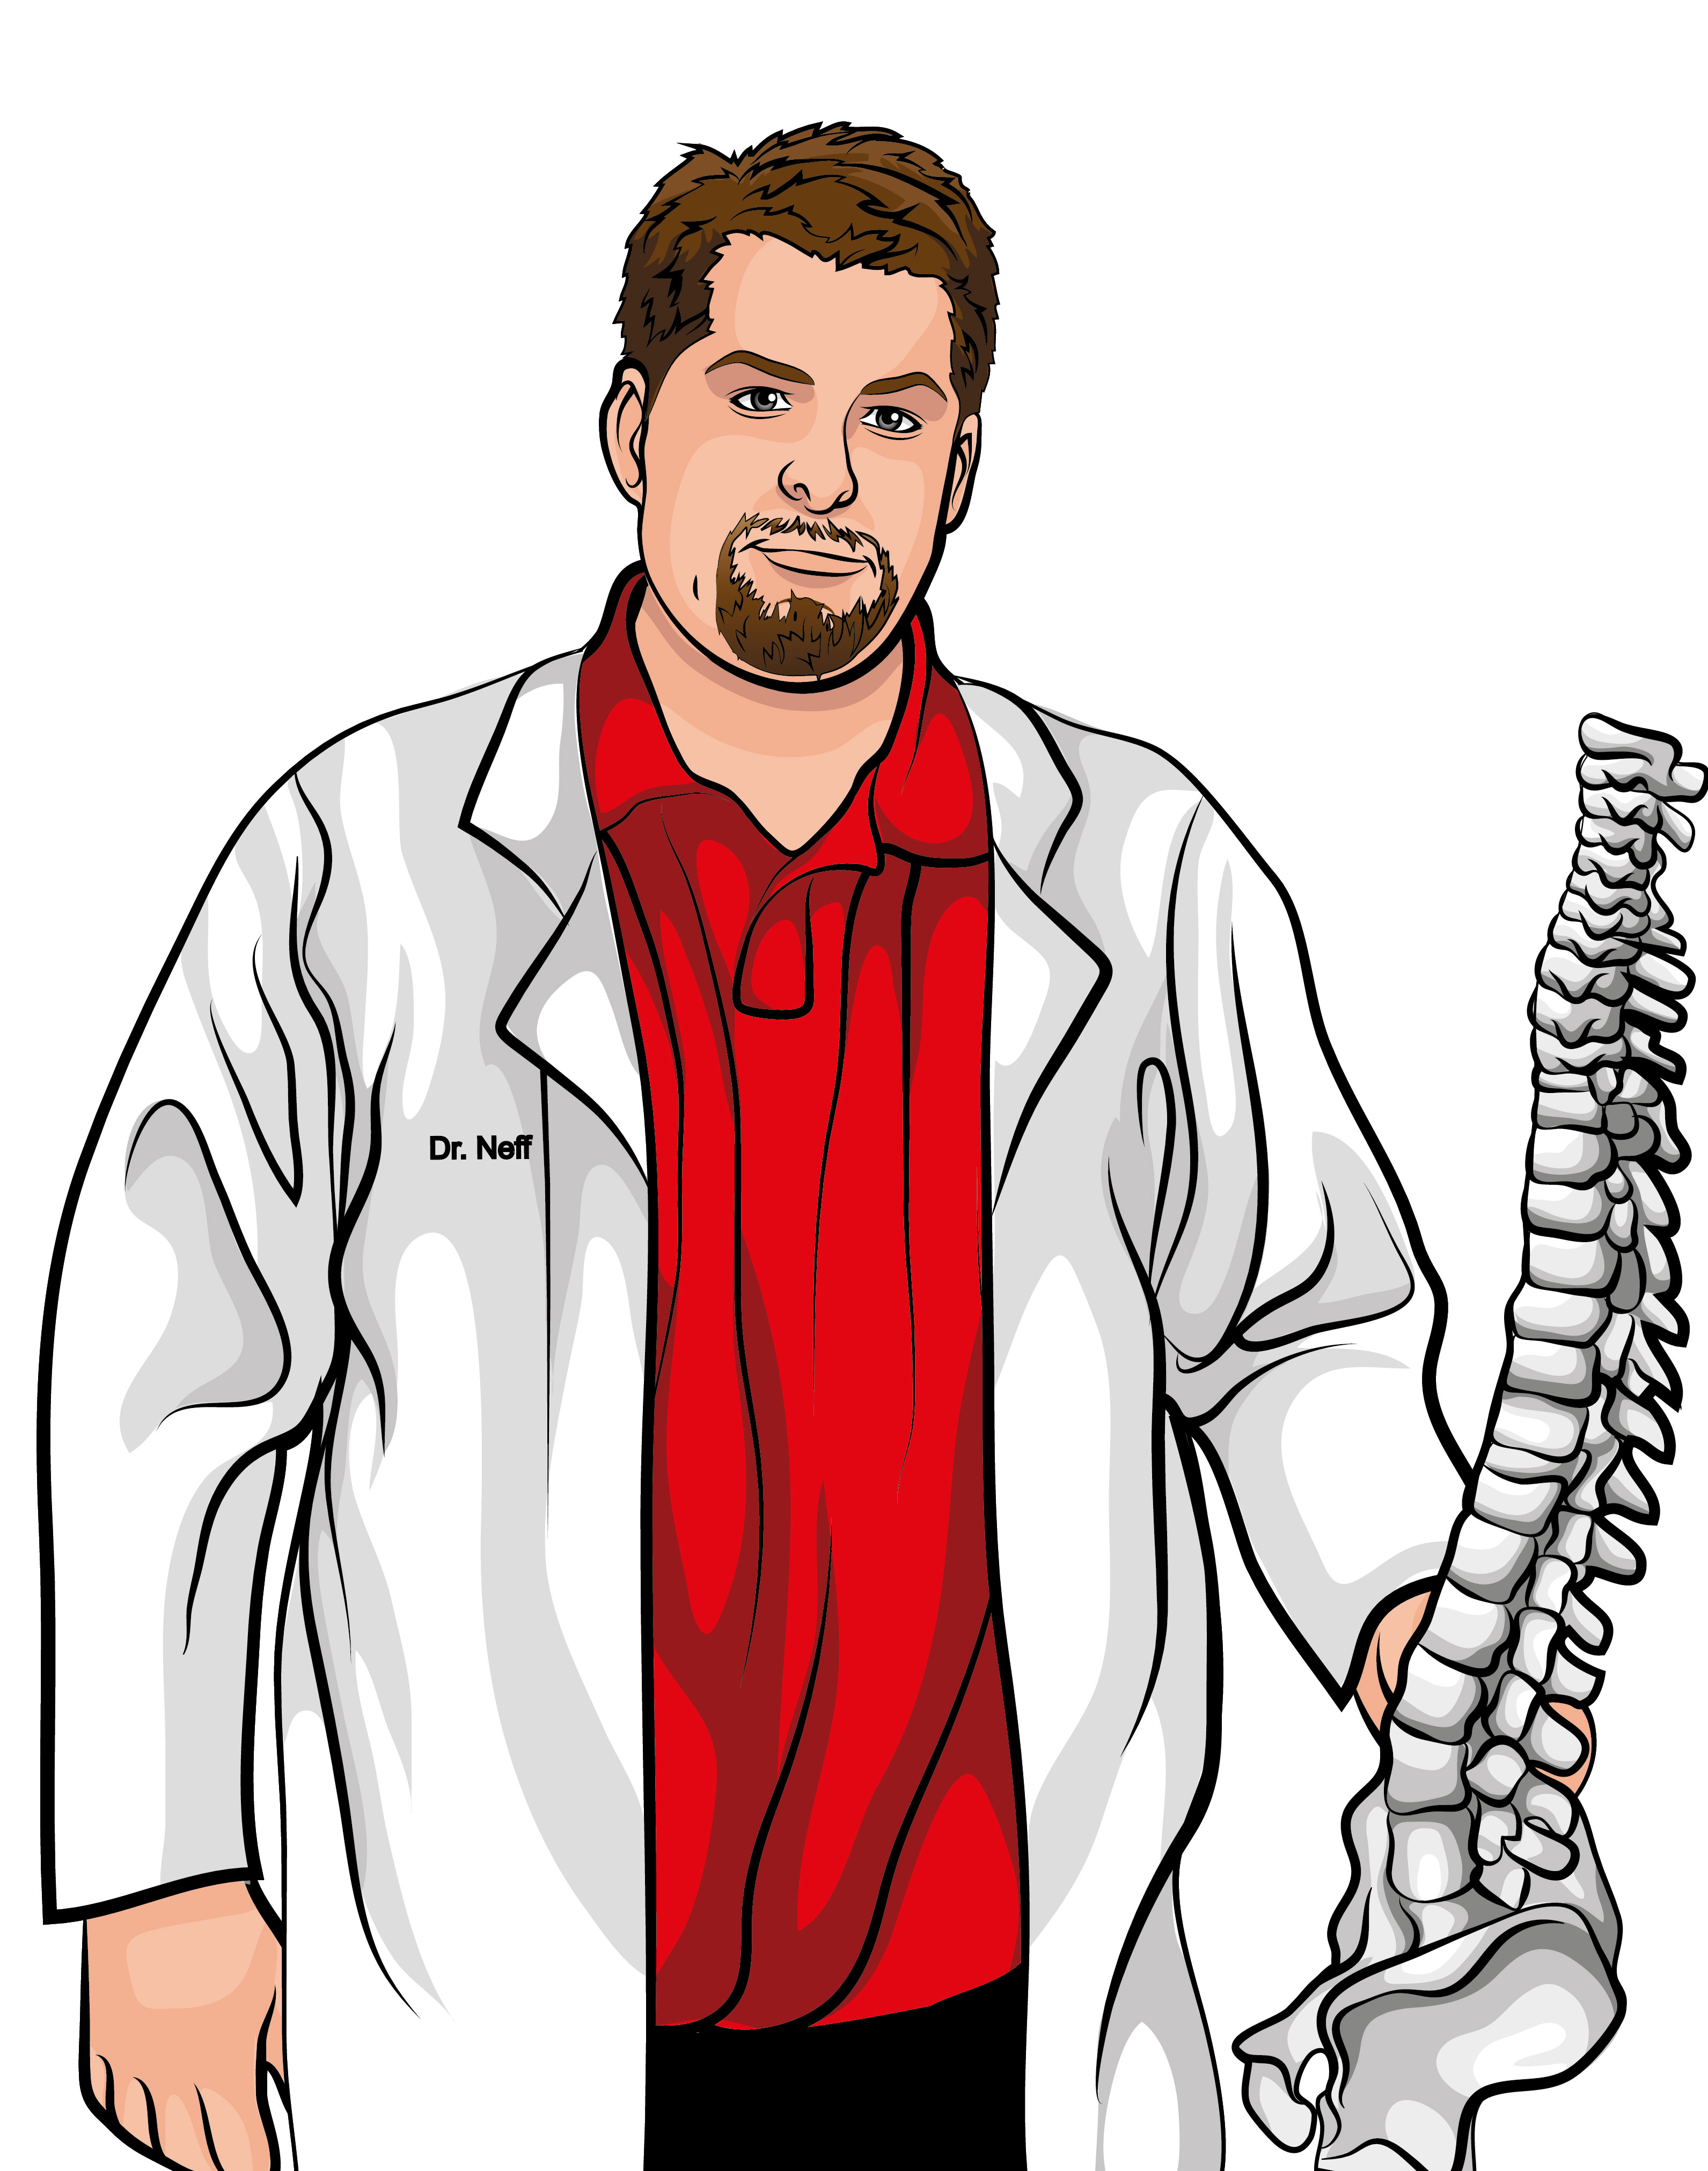 Dr Neff